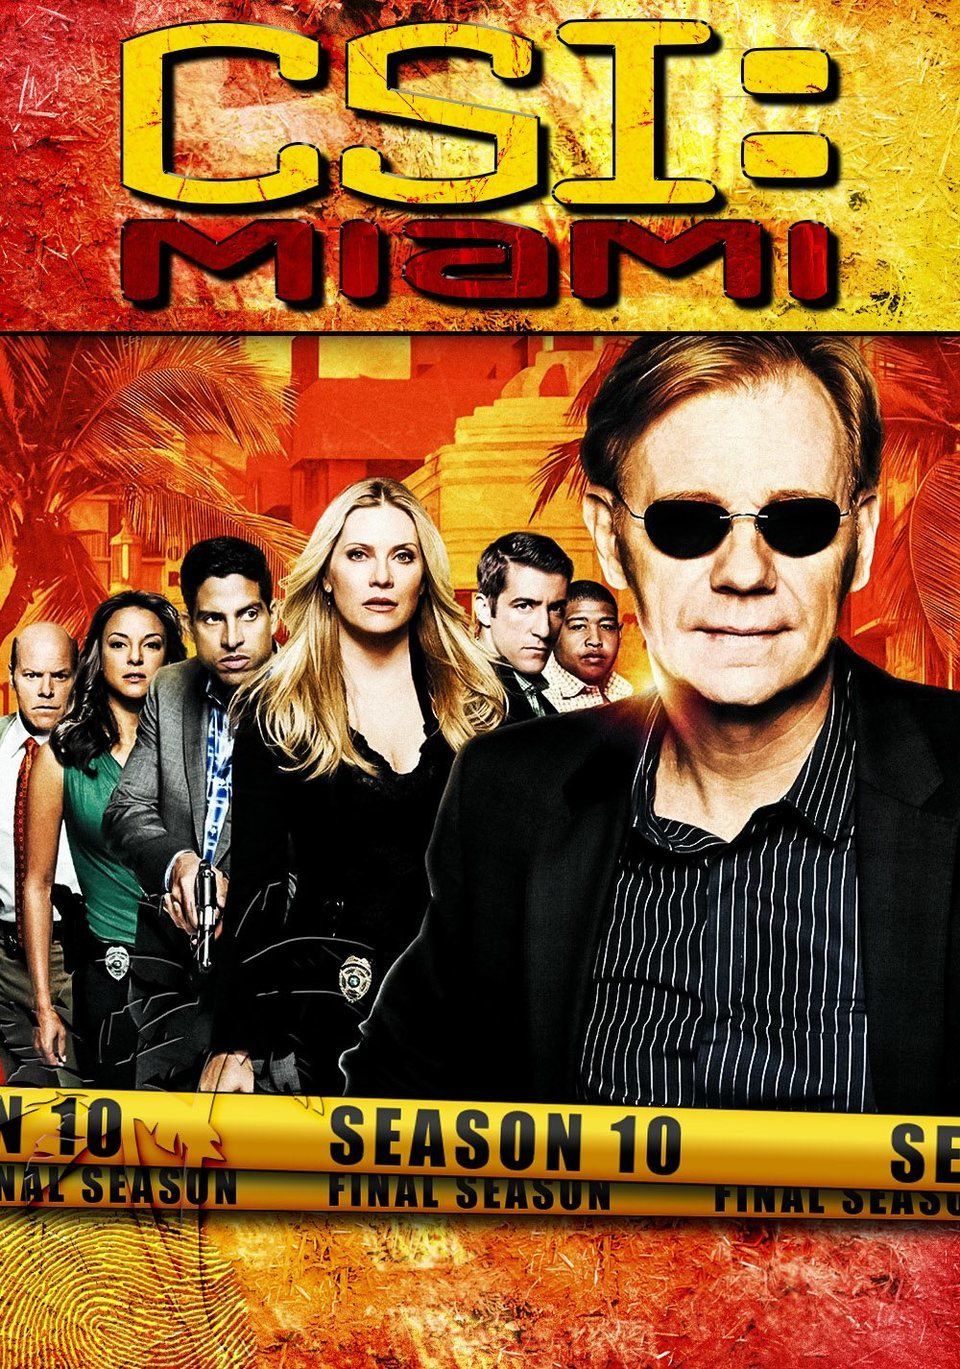 Cartel Temporada 10 de 'CSI: Miami'